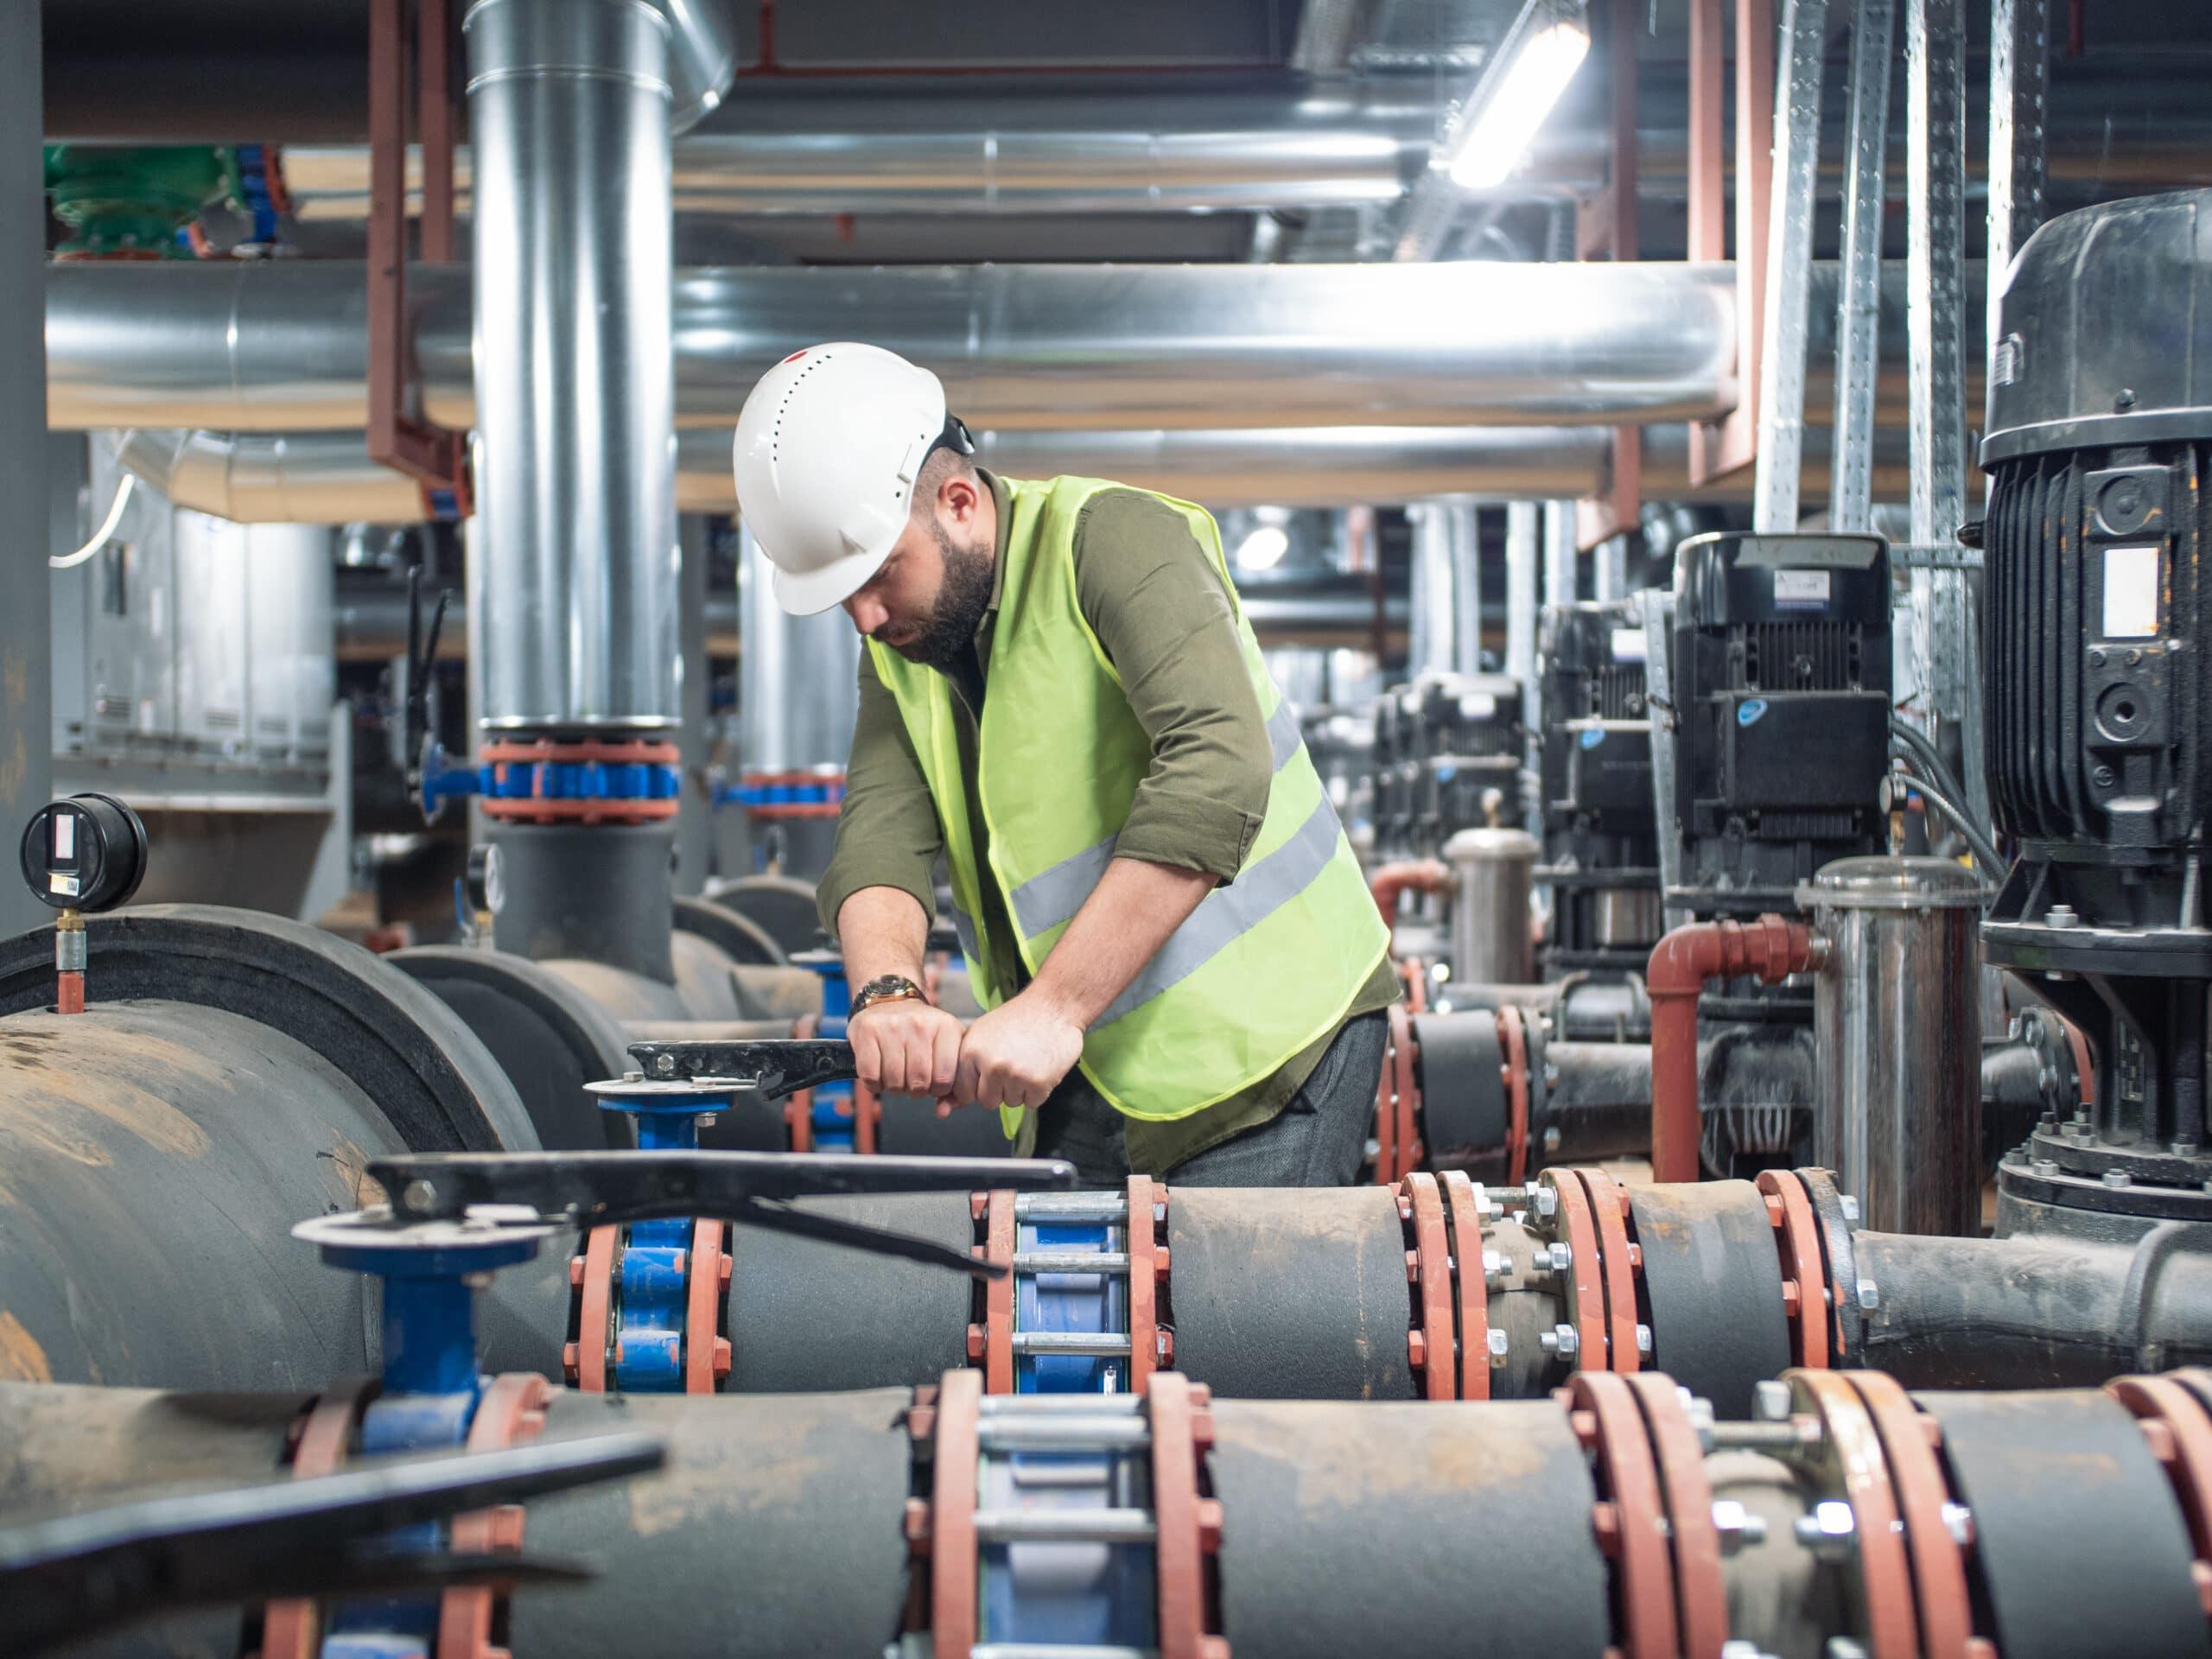 Man providing commercial maintenance